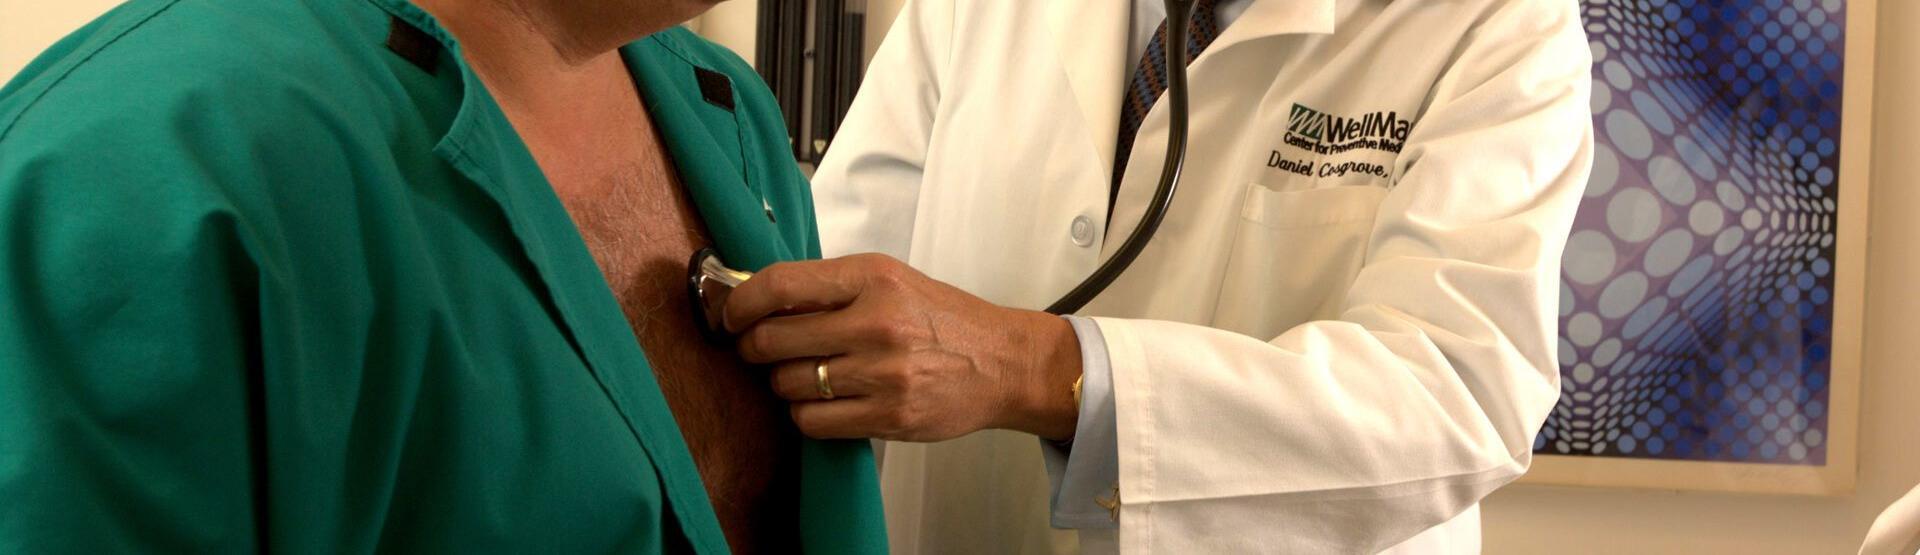 Med Spas - Health & Wellness in Greater Palm Springs